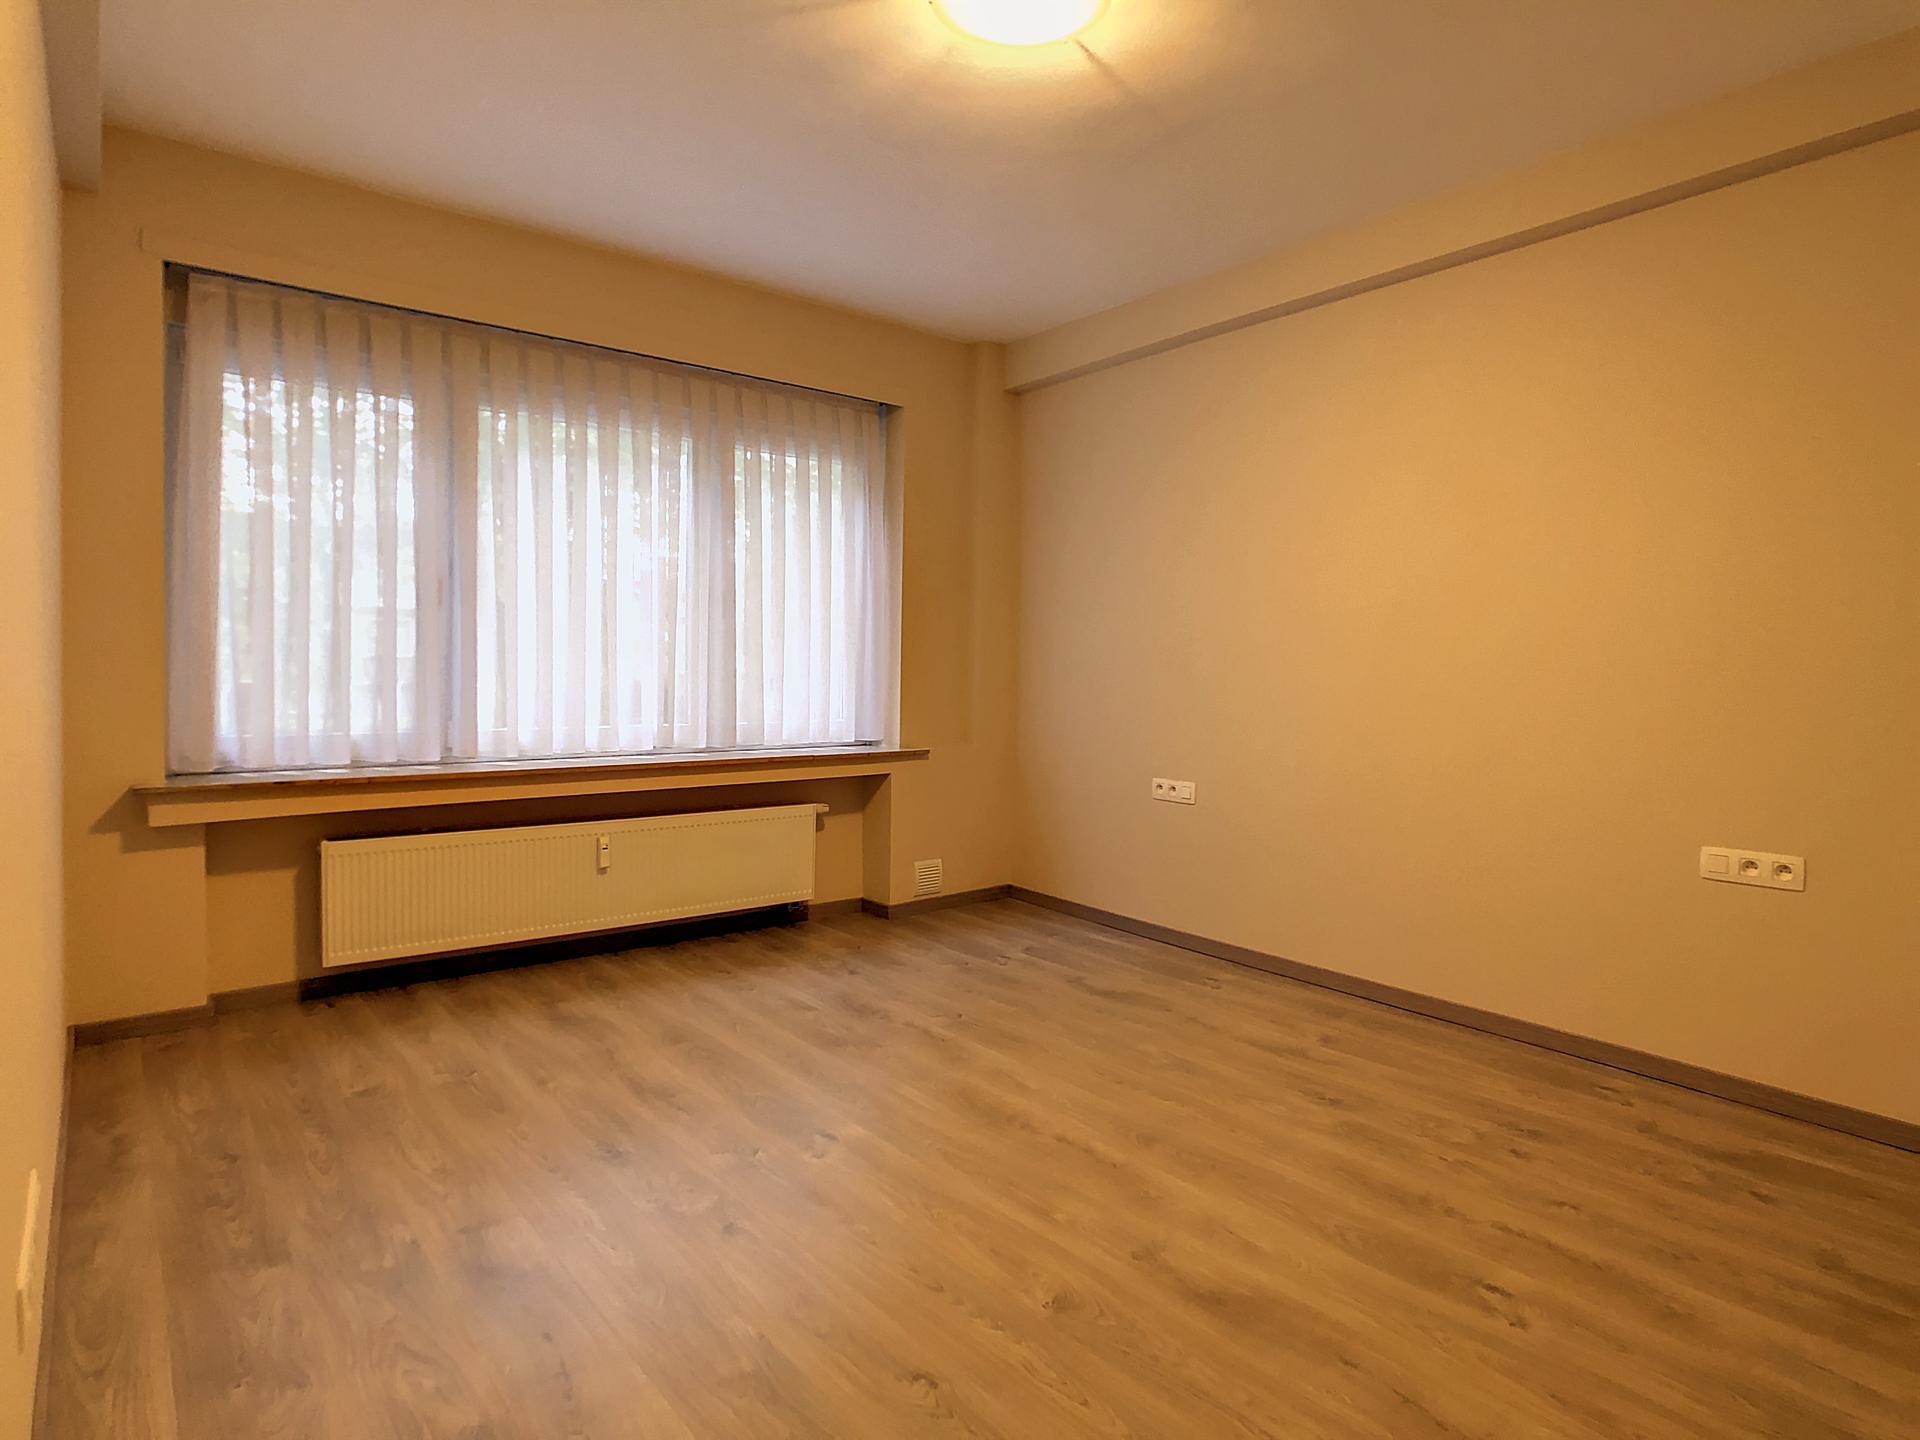 Appartement - Anderlecht - #4519665-2